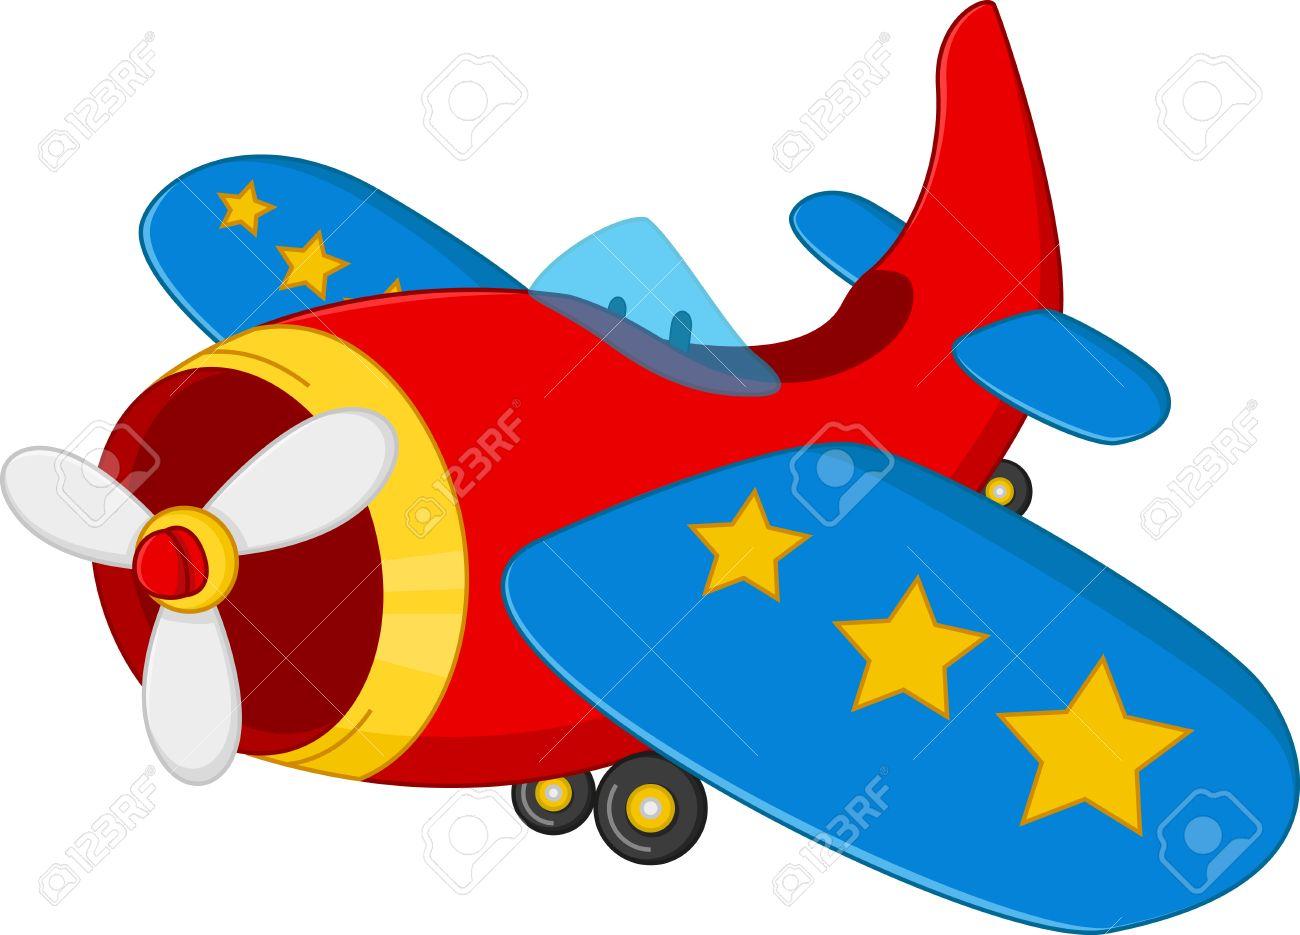 Cartoon Air Plane Royalty Free Cliparts Vectors And Stock